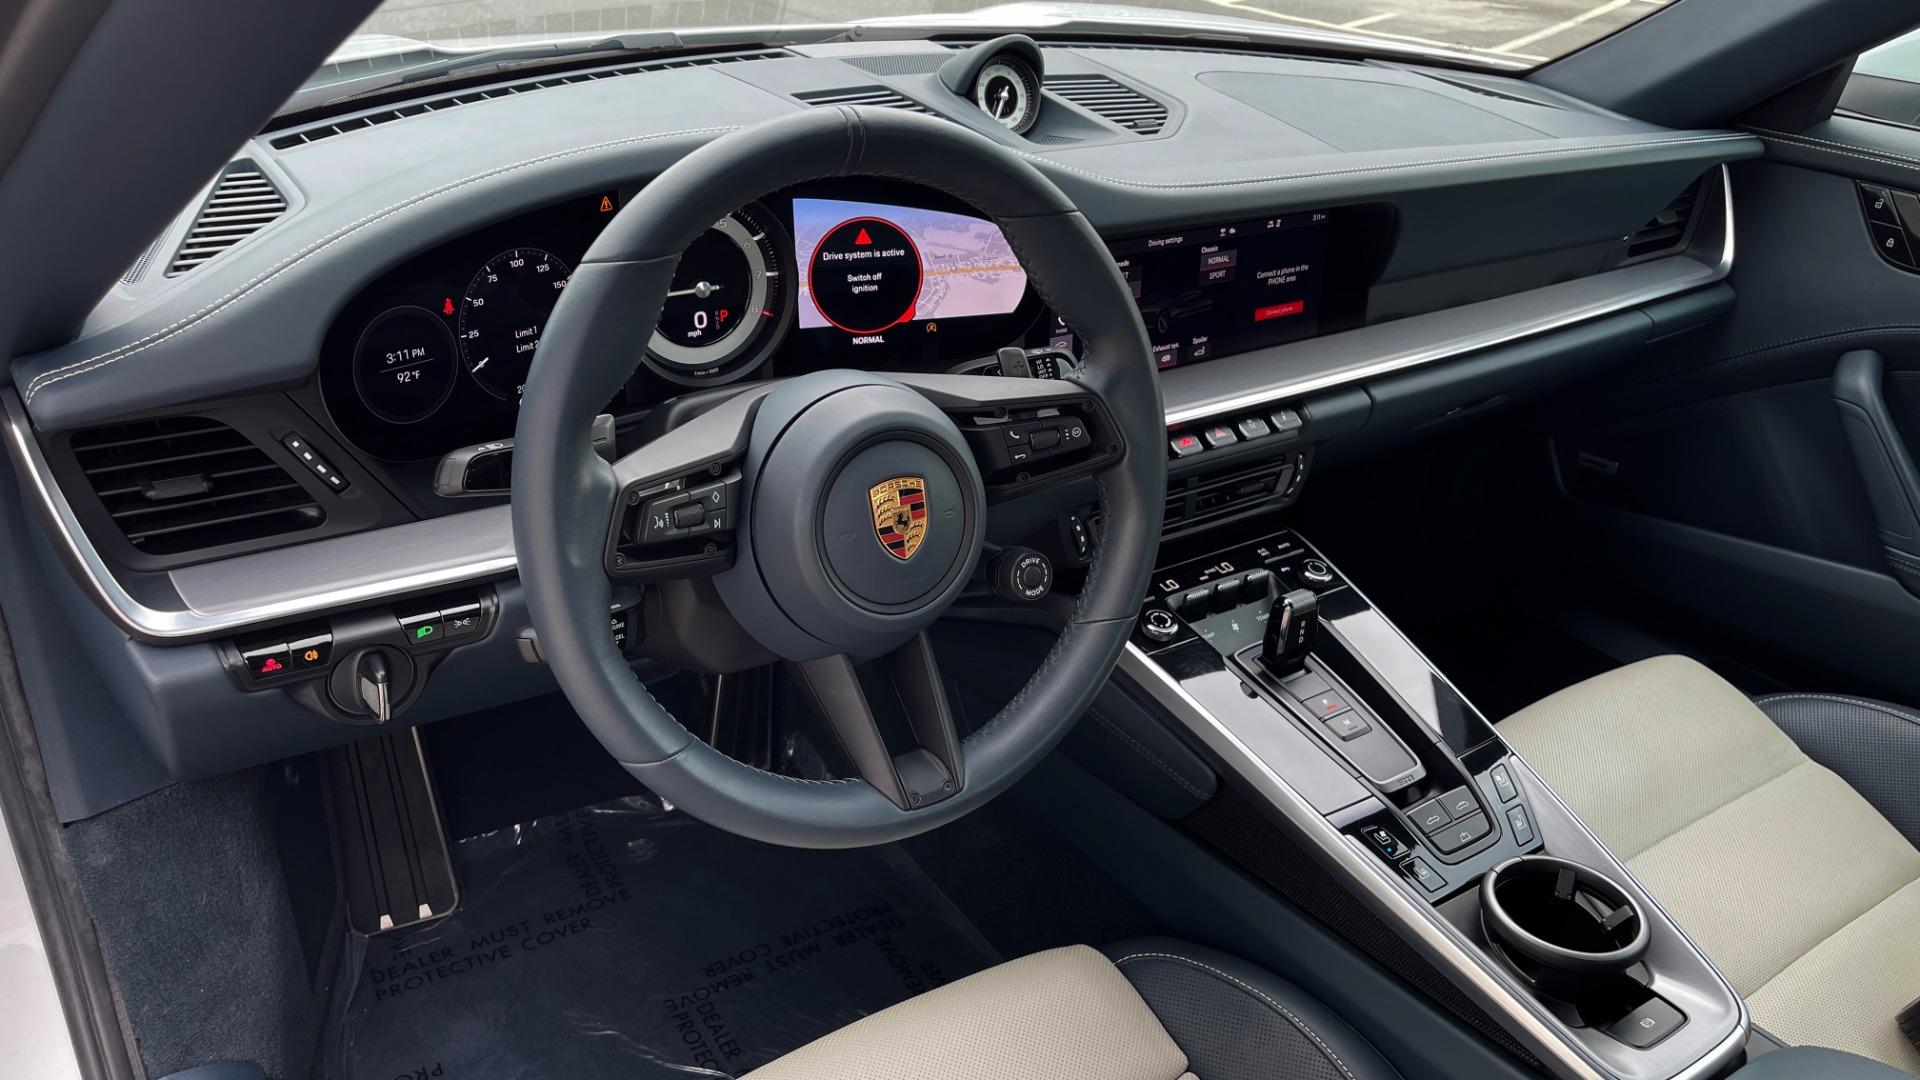 Used 2020 Porsche 911 CARRERA 4S CABRIOLET PREMIUM SPORT PKG / NAV / BOSE / LIGHT DESIGN PKG for sale $167,595 at Formula Imports in Charlotte NC 28227 44